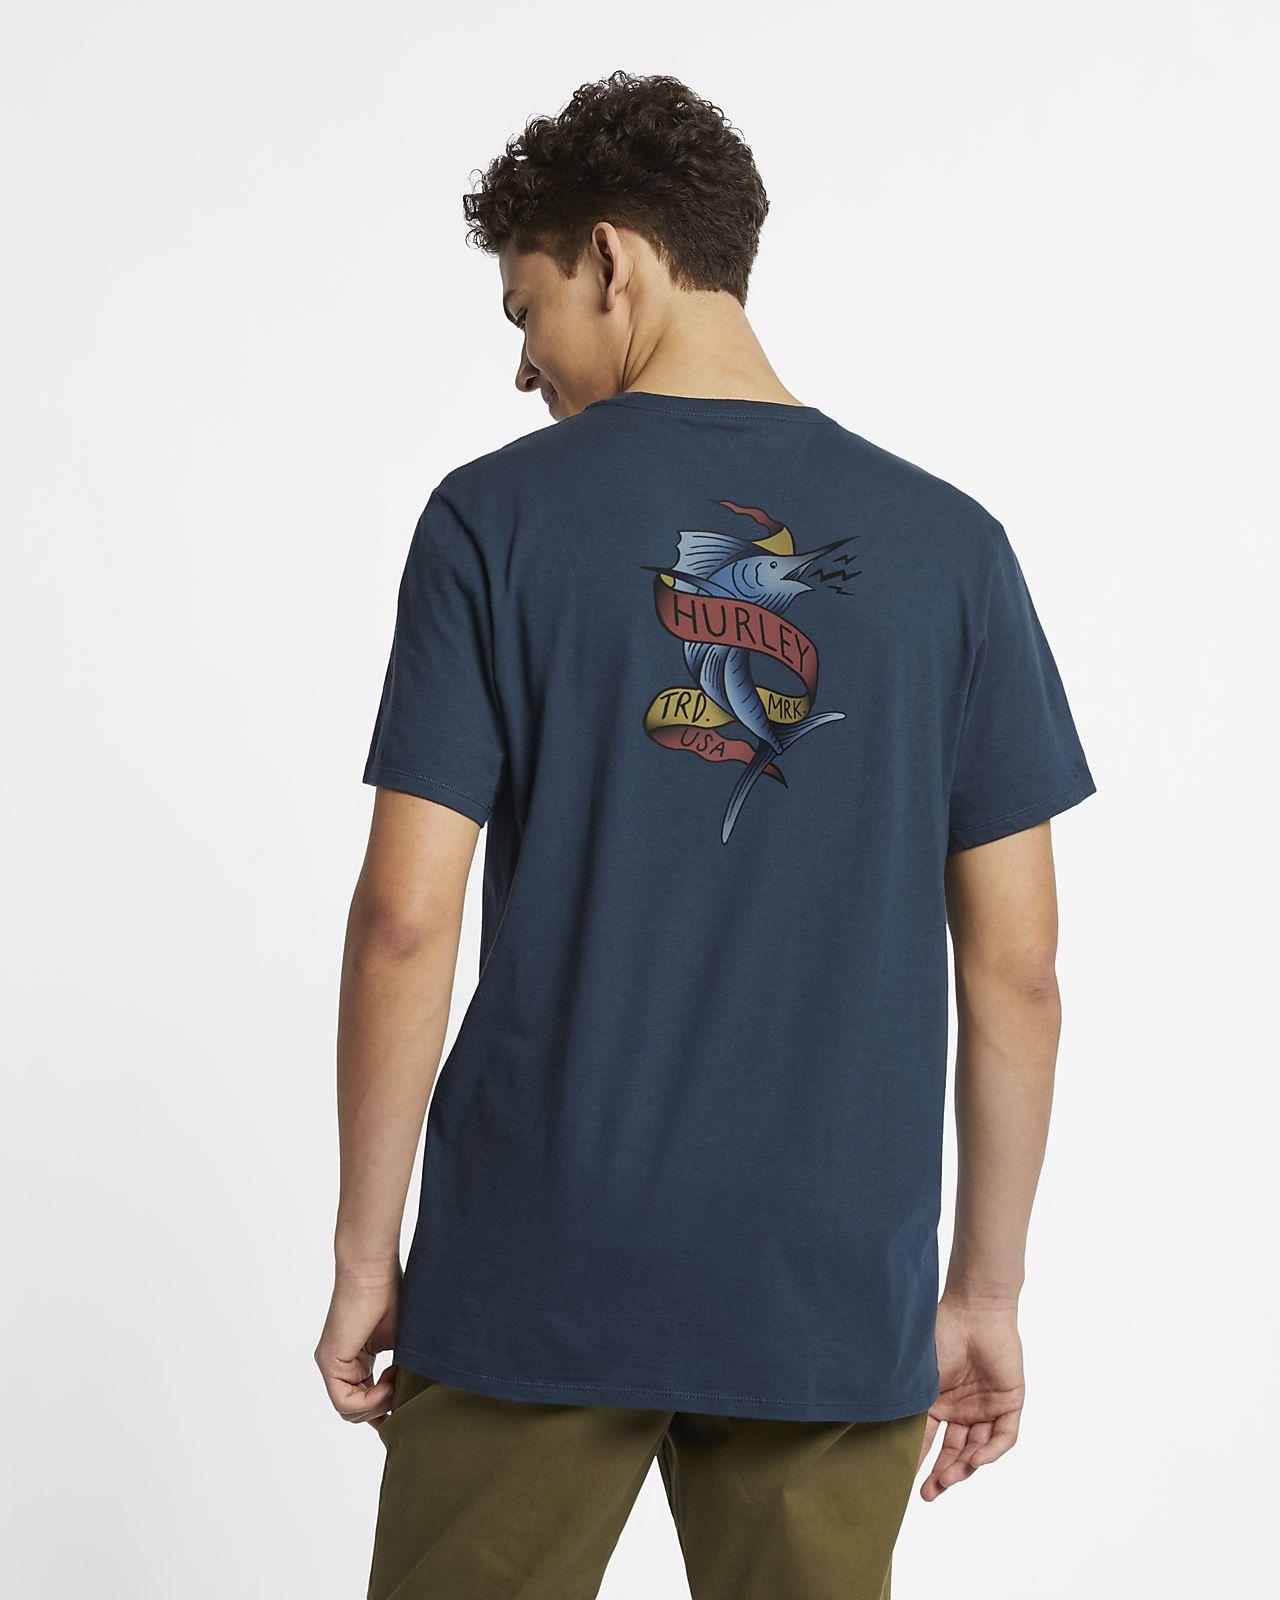 Hurley Premium Marlin Men's T-Shirt